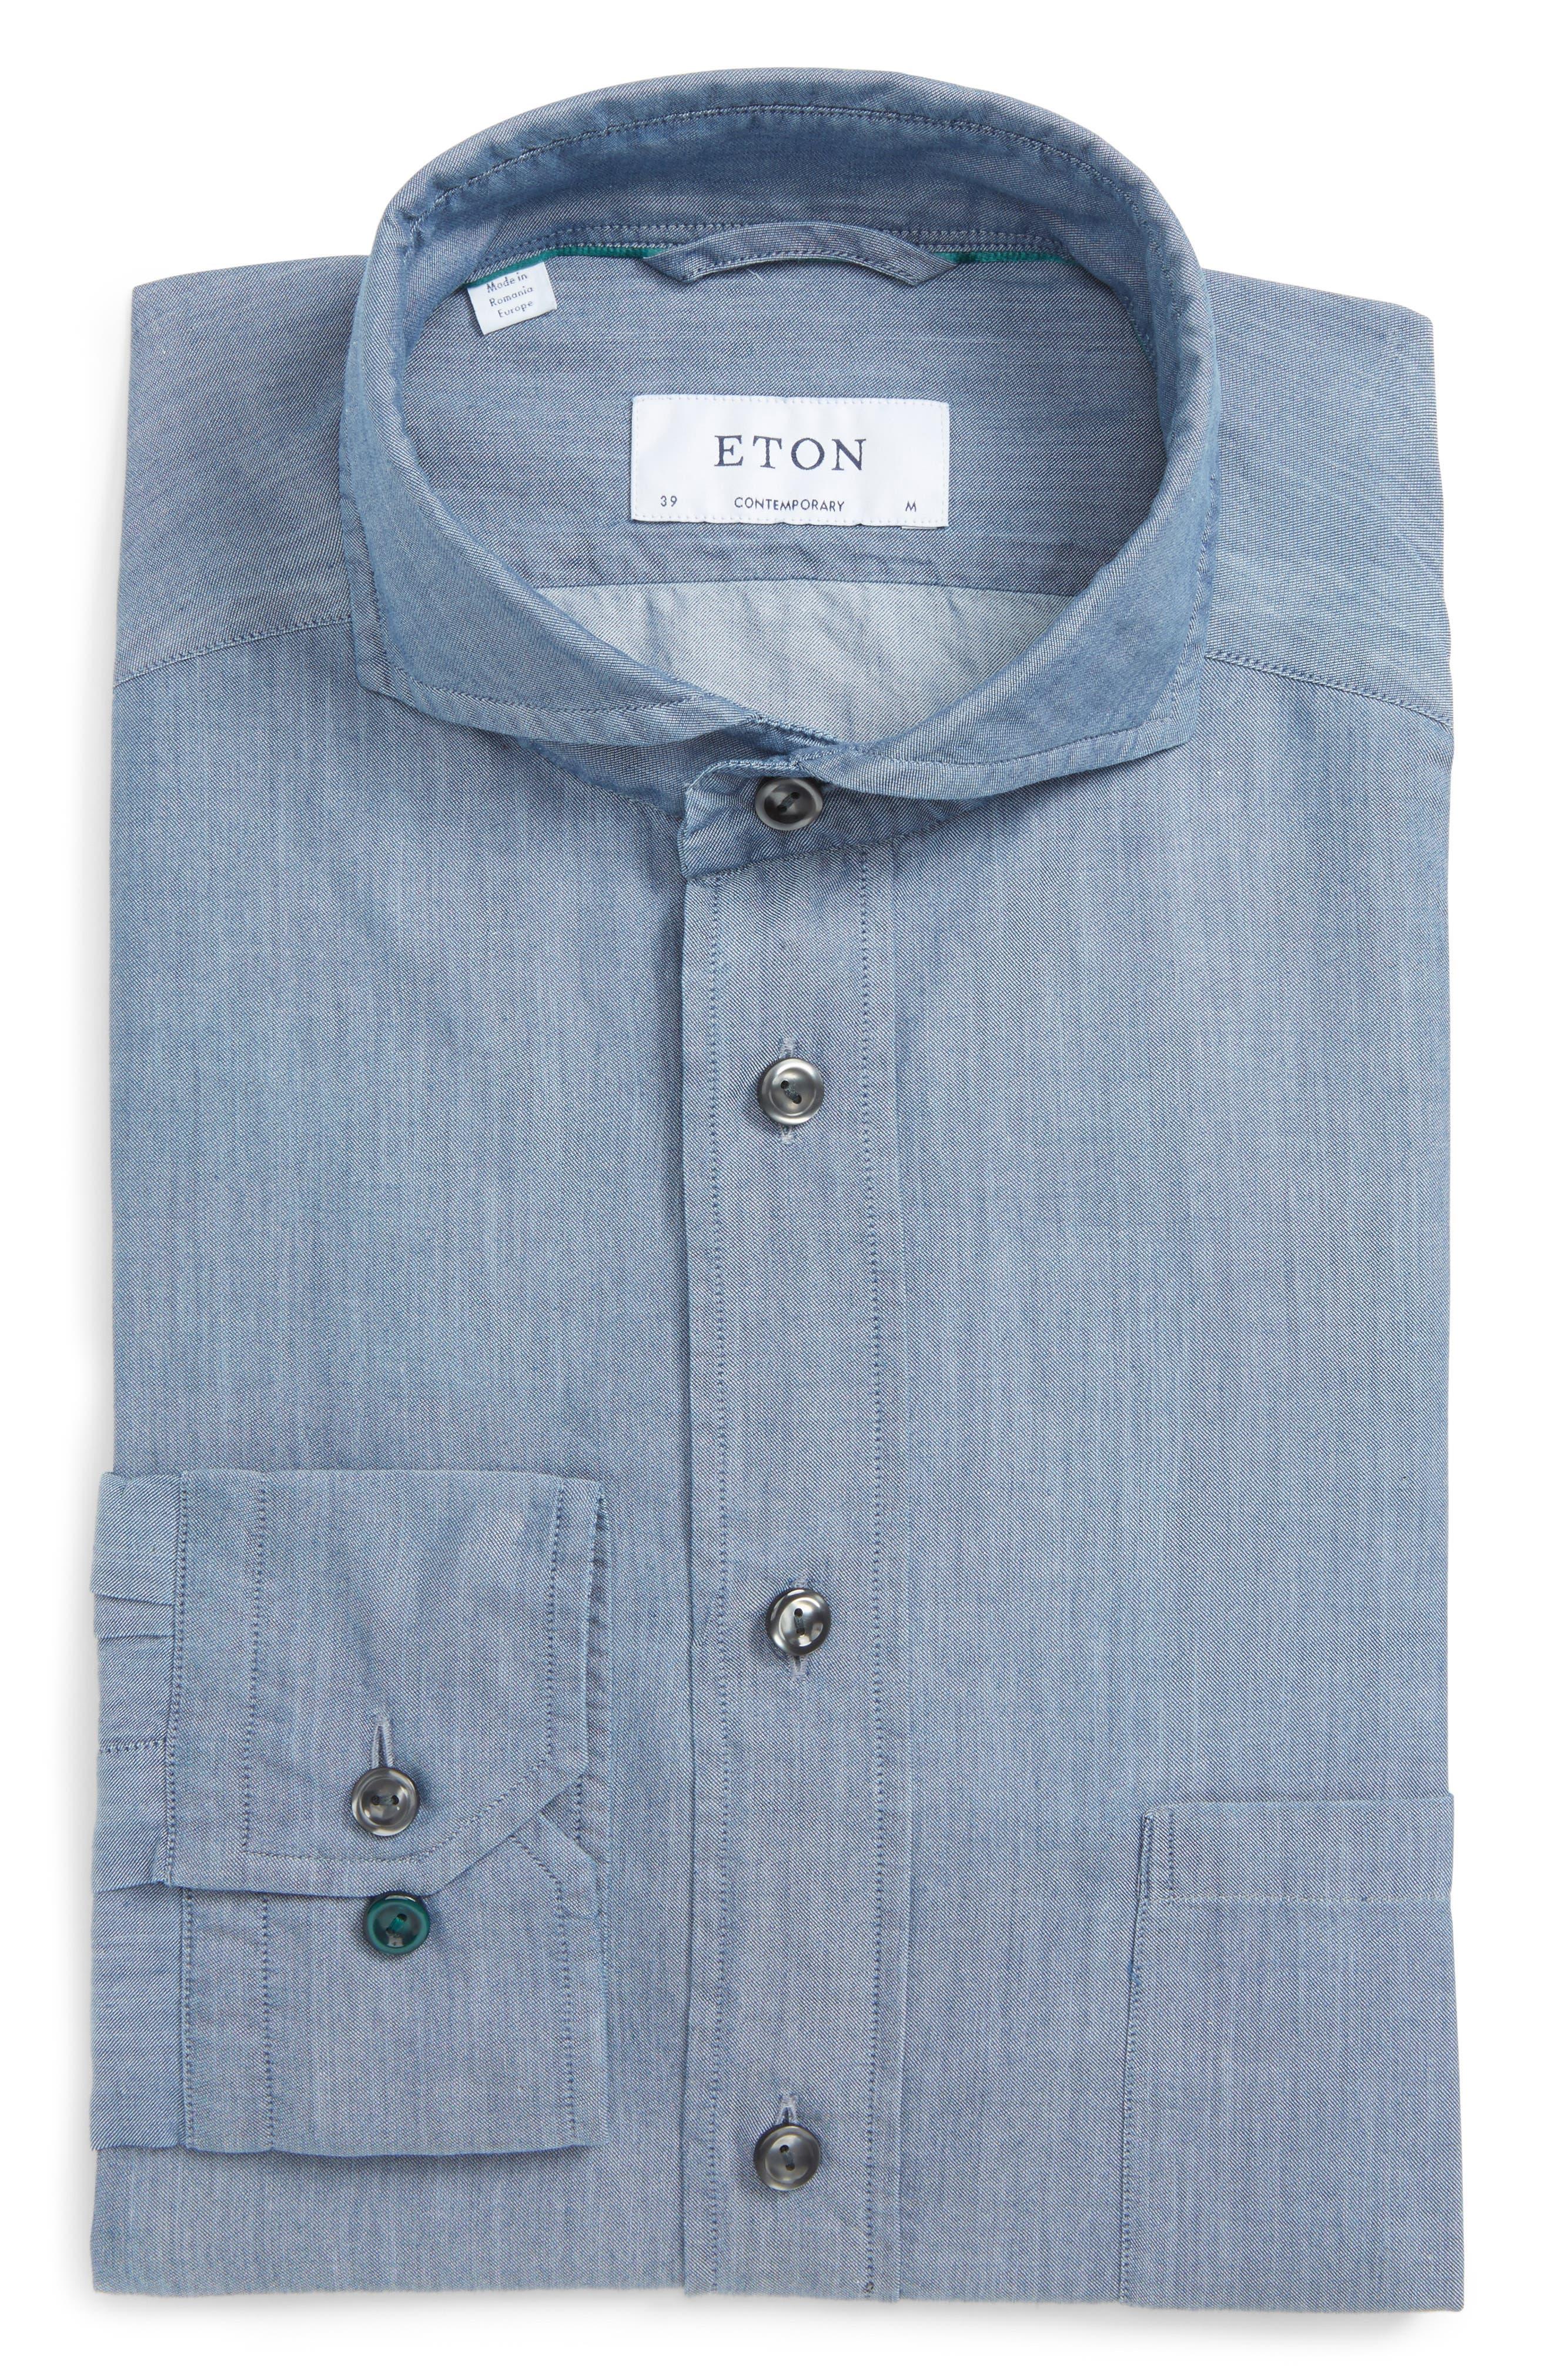 Eton Contemporary Fit Chambray Dress Shirt